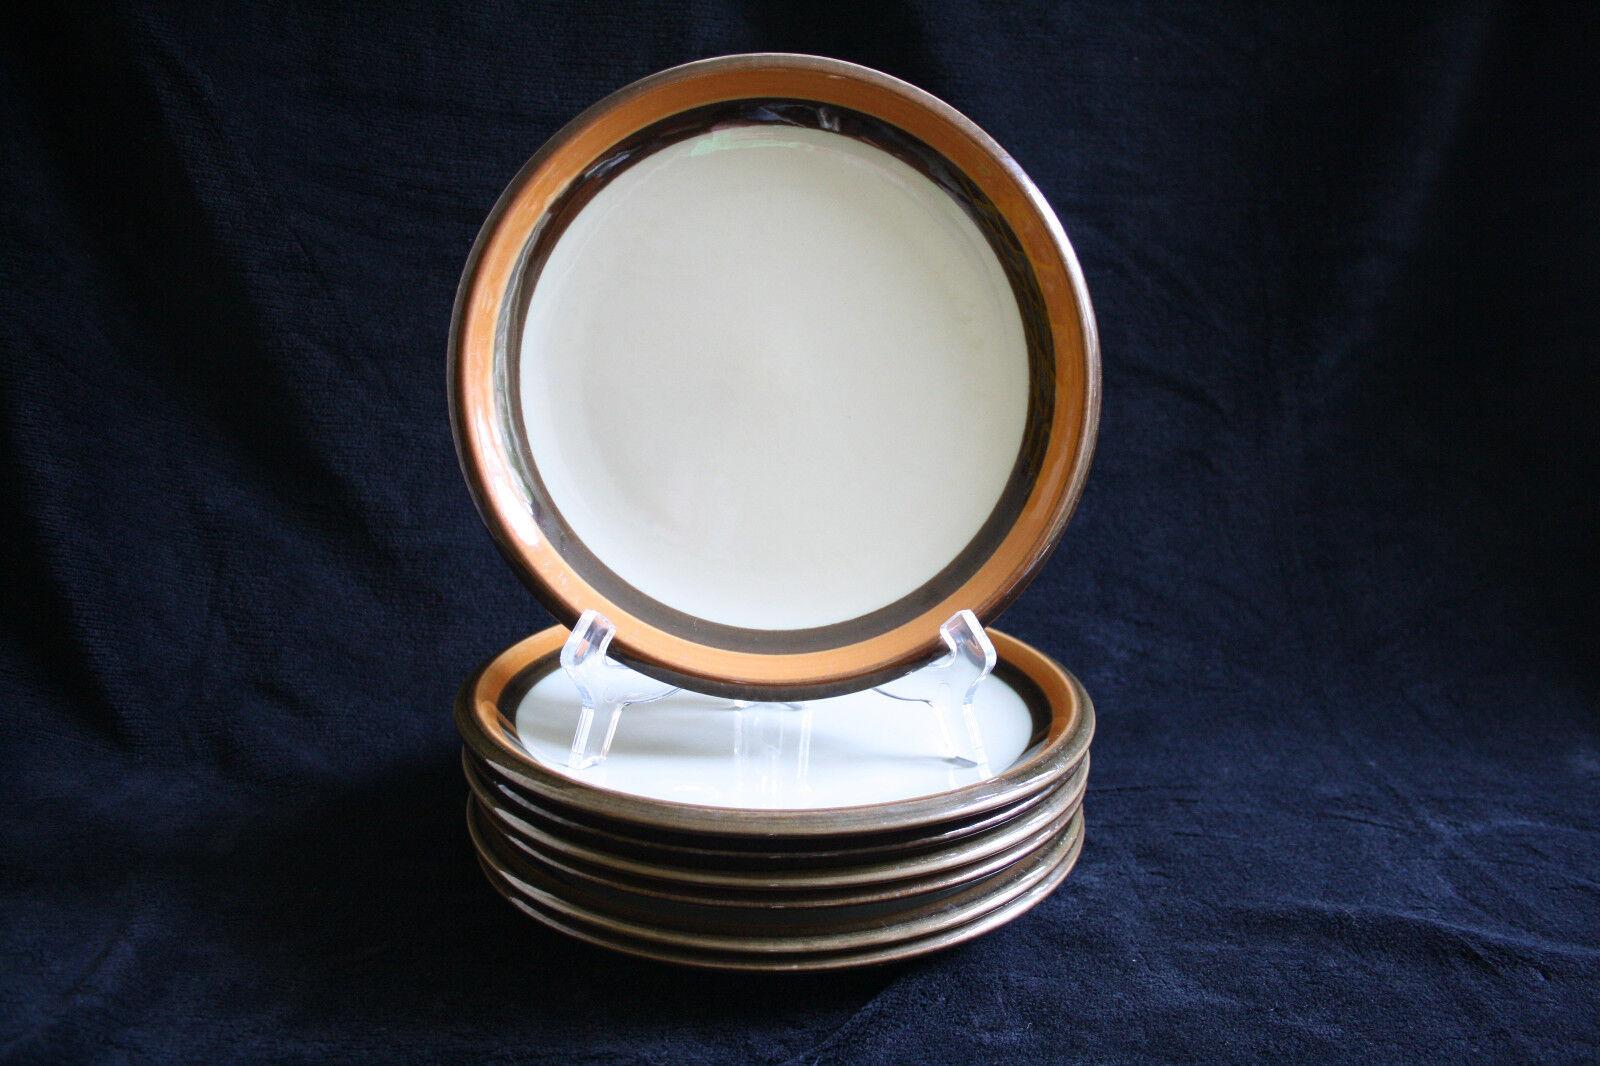 7x vintage dinner plate Rörstrand Annika, Made in Sweden